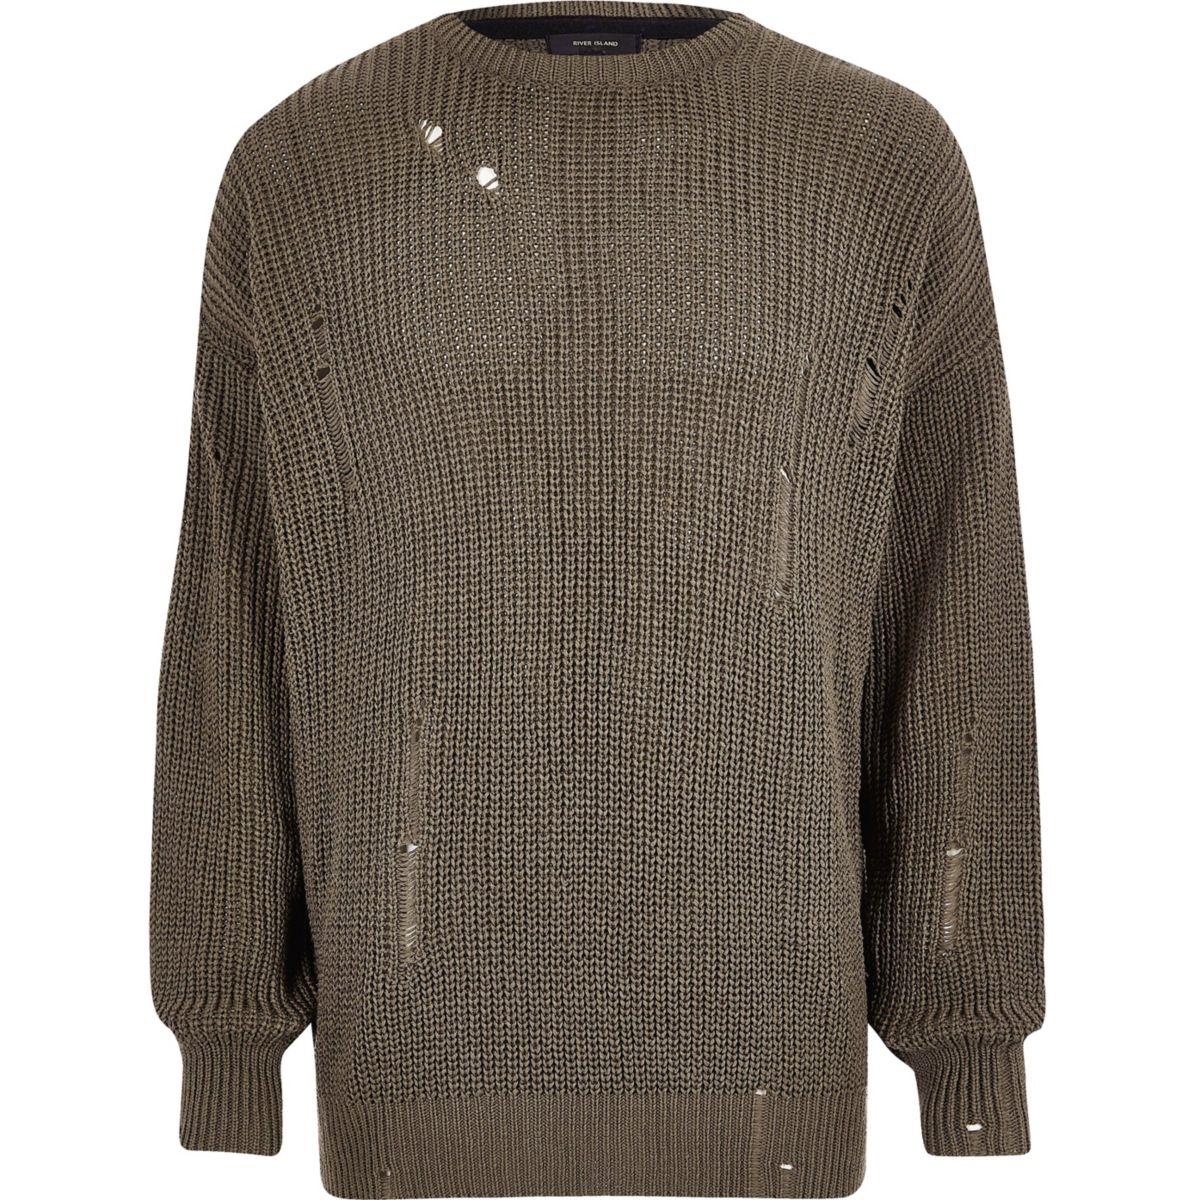 Dark green knit oversized fisherman sweater